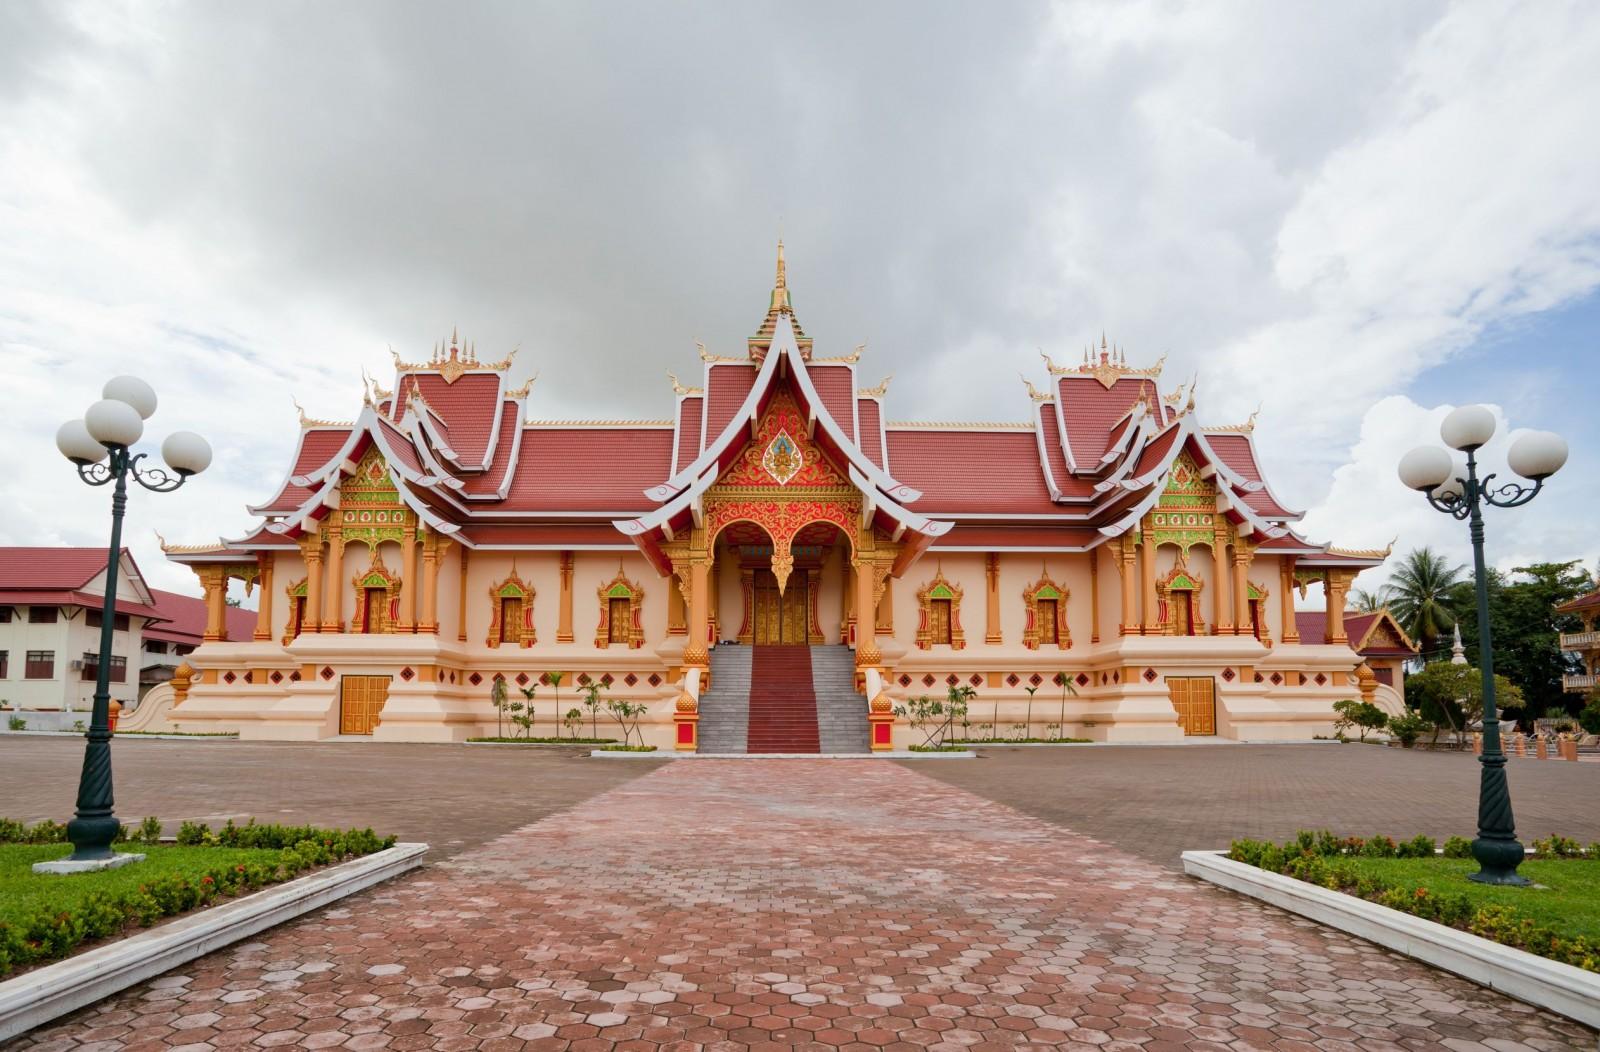 pha-that-temple-in-vientiane-laos-1600x1052.jpg